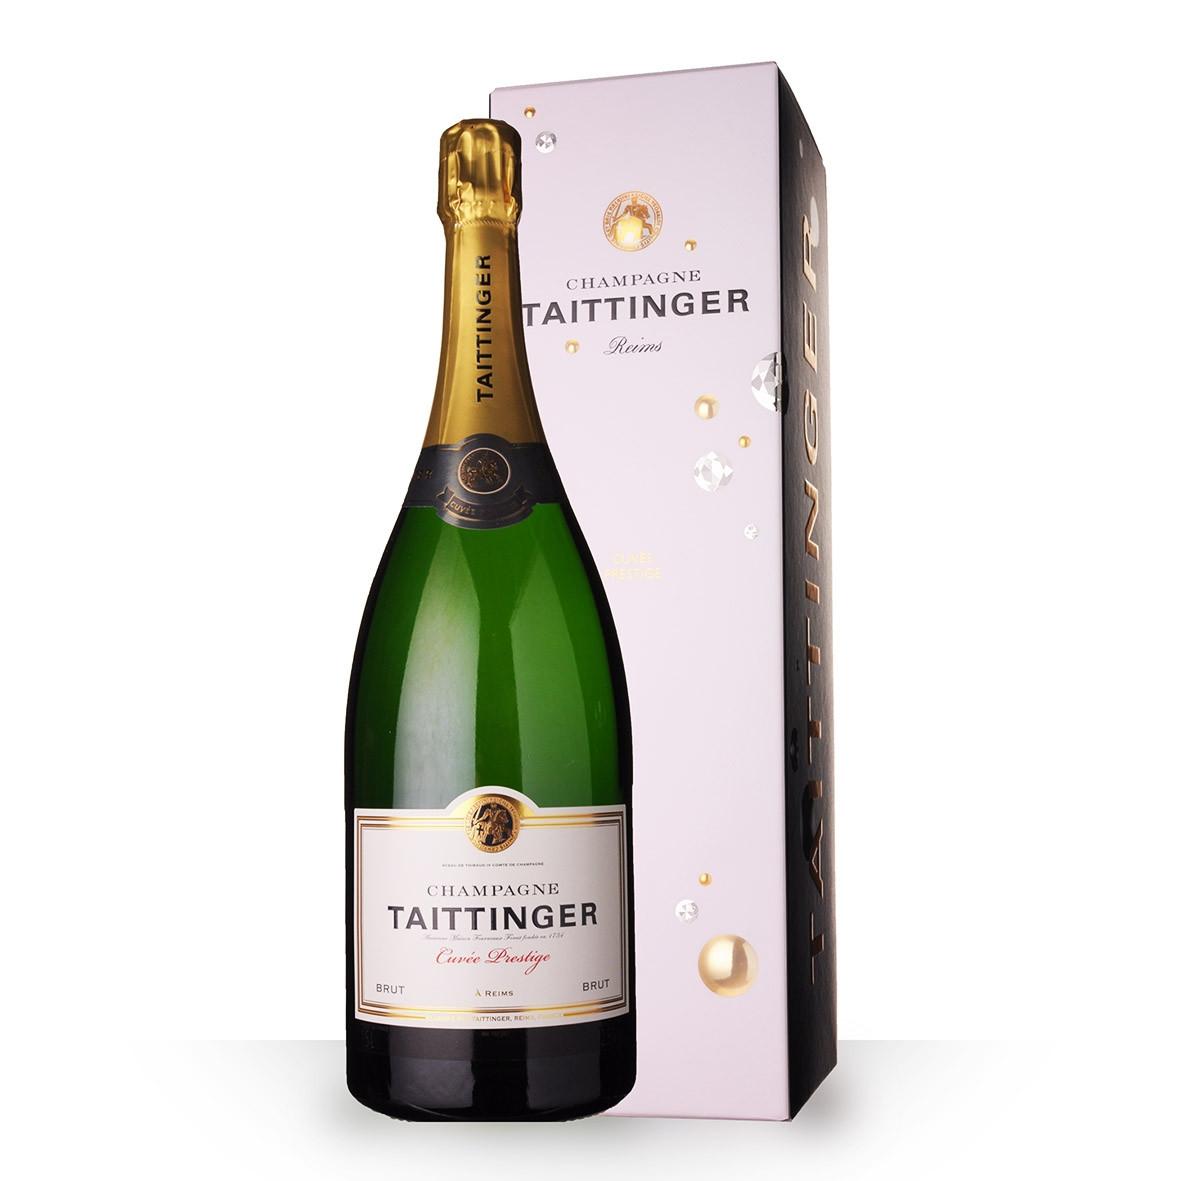 Champagne Taittinger Prestige 150cl Etui www.odyssee-vins.com